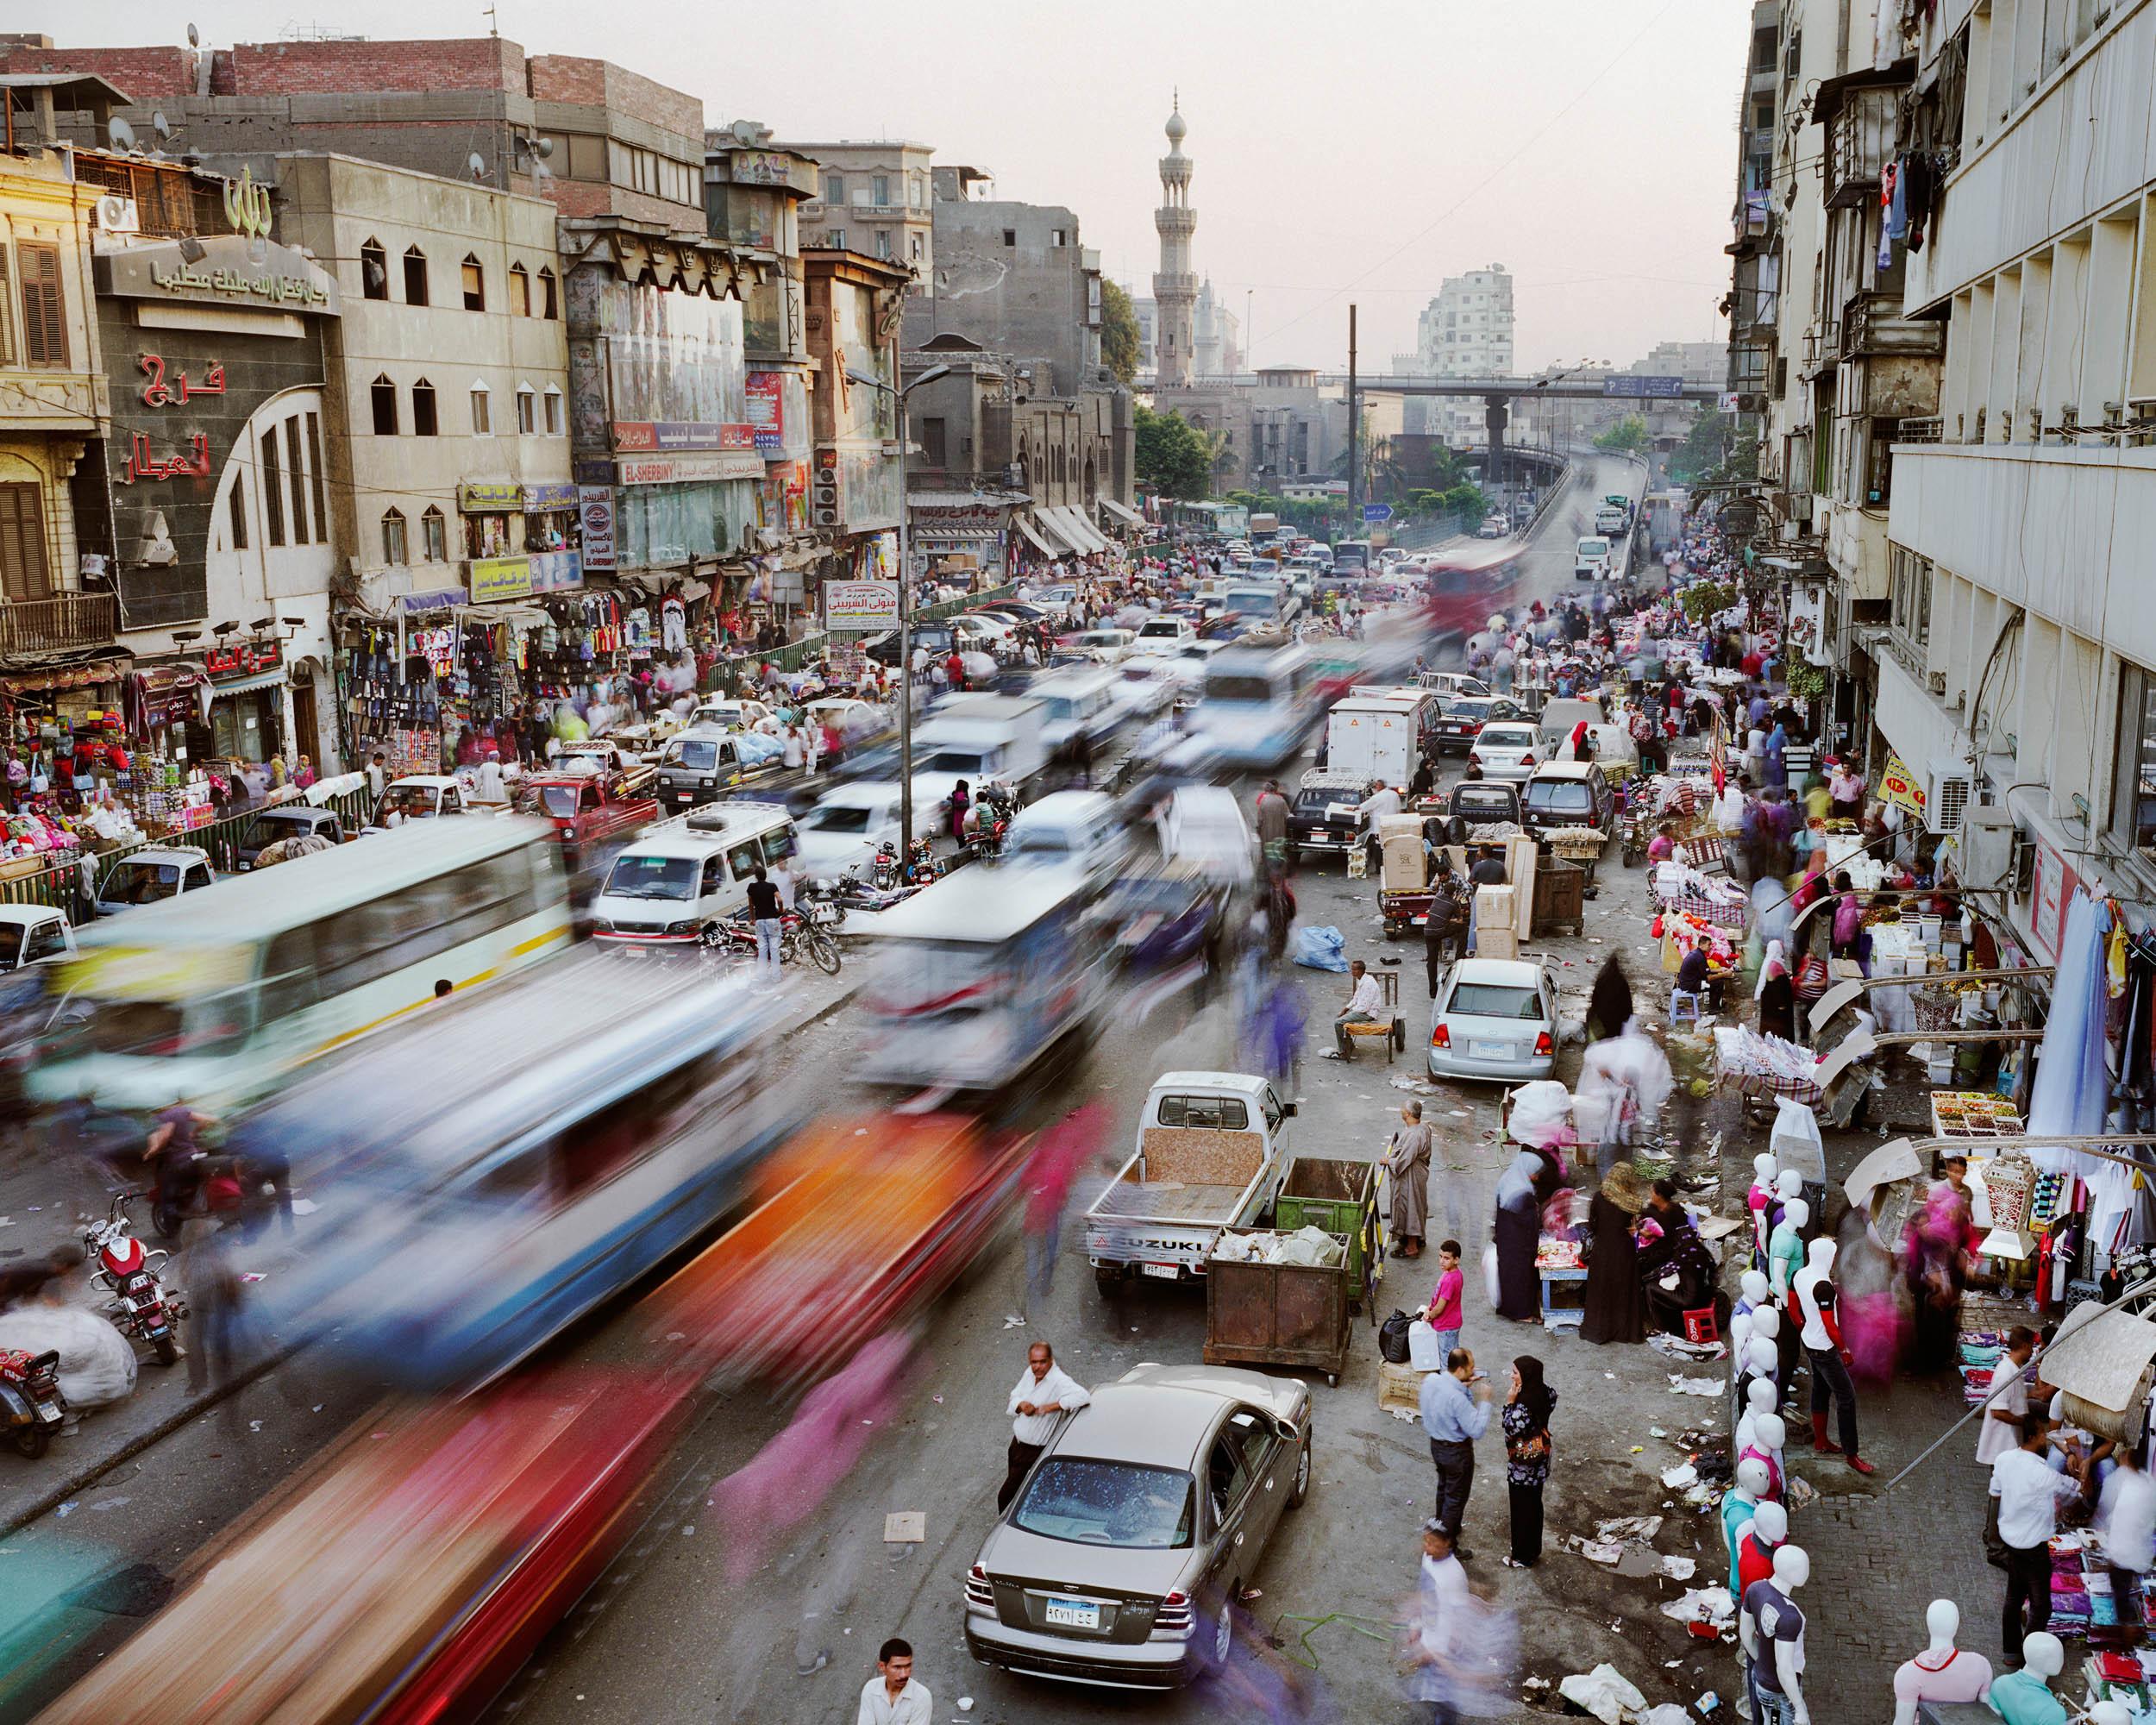 Port Said Street, Islamic Cairo, Cairo, Egypt